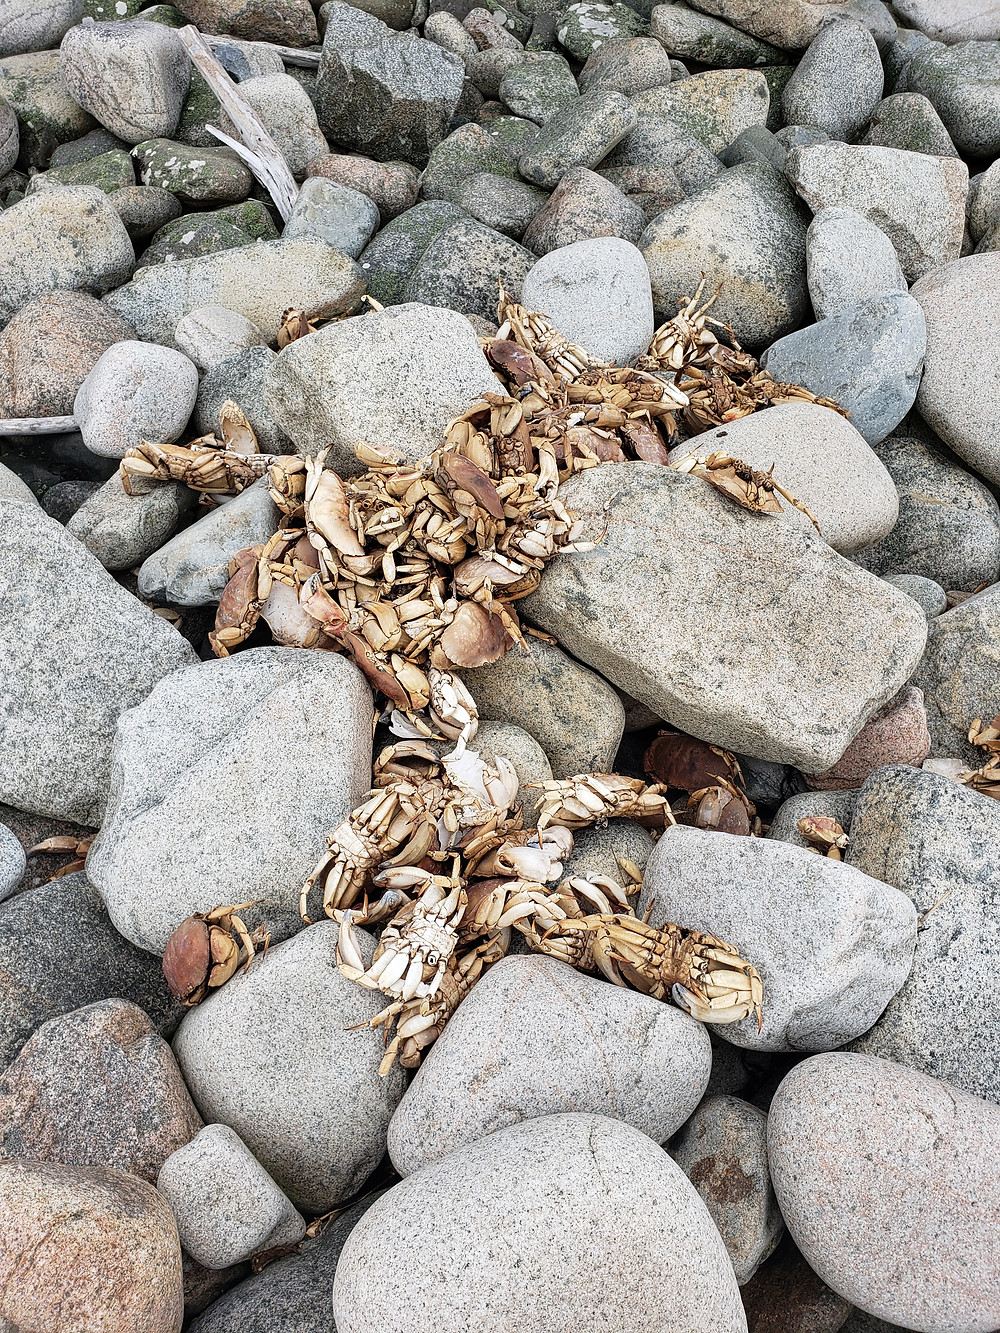 pile of dead crabs on rocks in Millbridge Maine